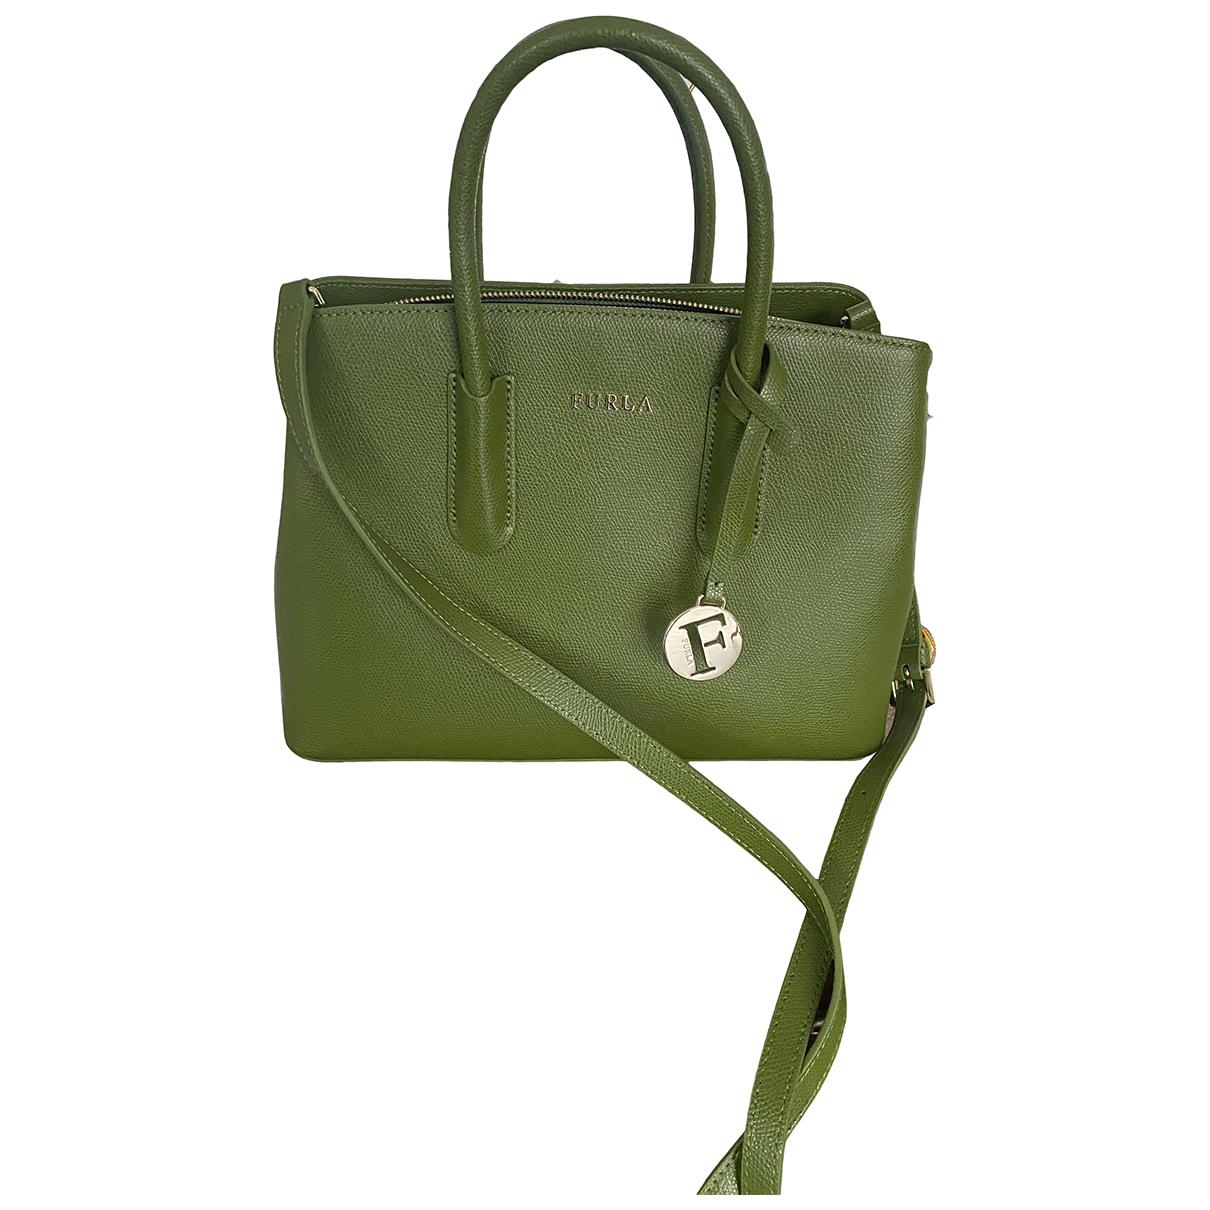 Furla - Sac a main   pour femme en cuir - vert